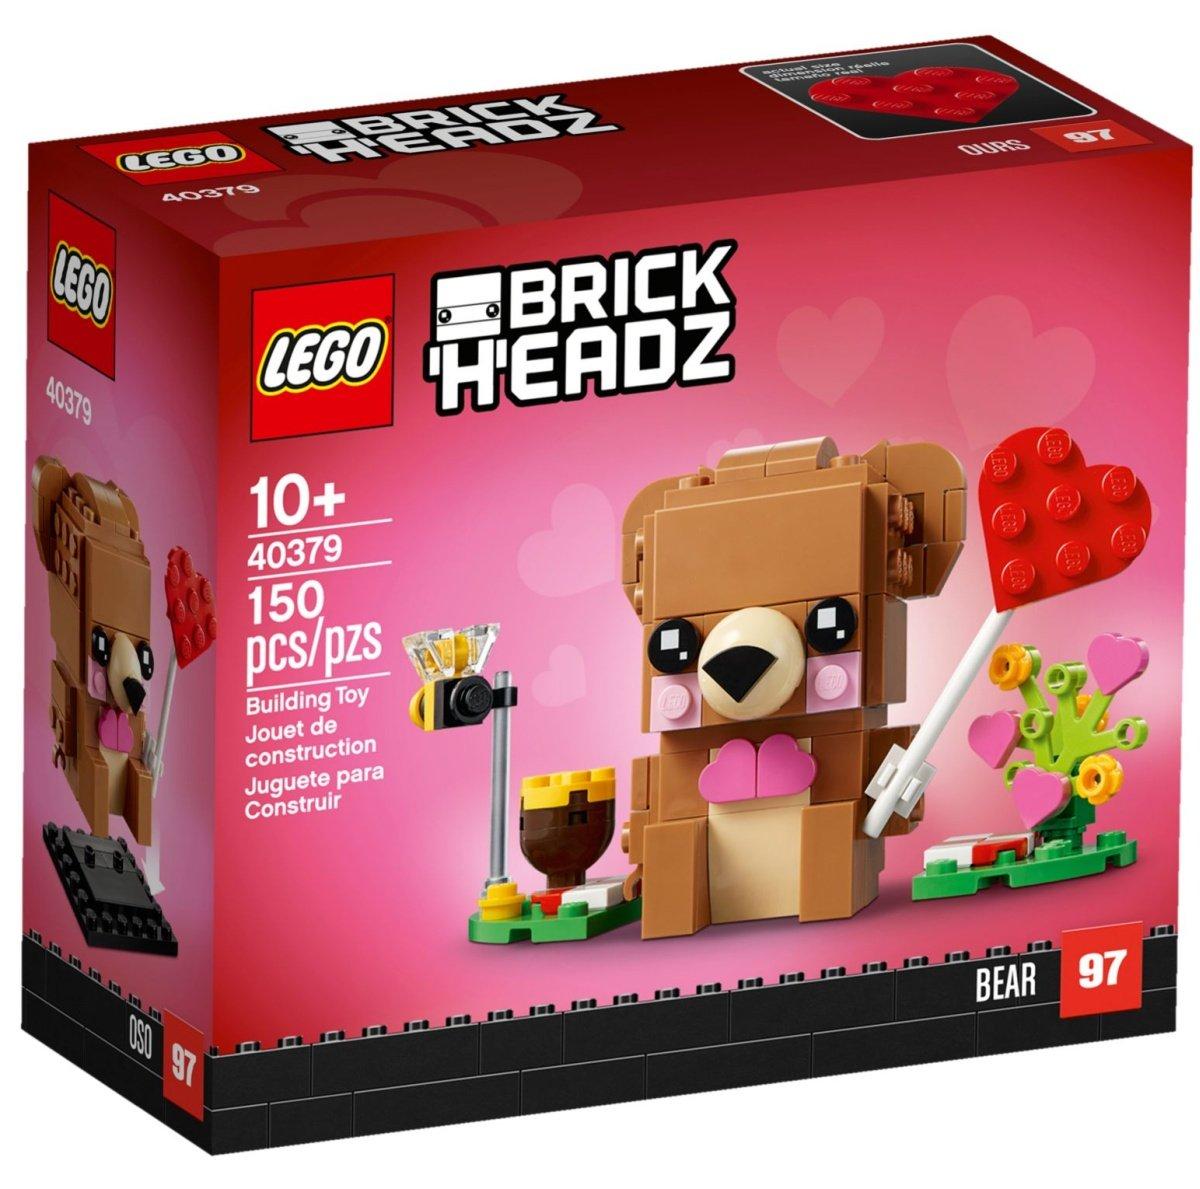 lego-brickheadz-40379-0002